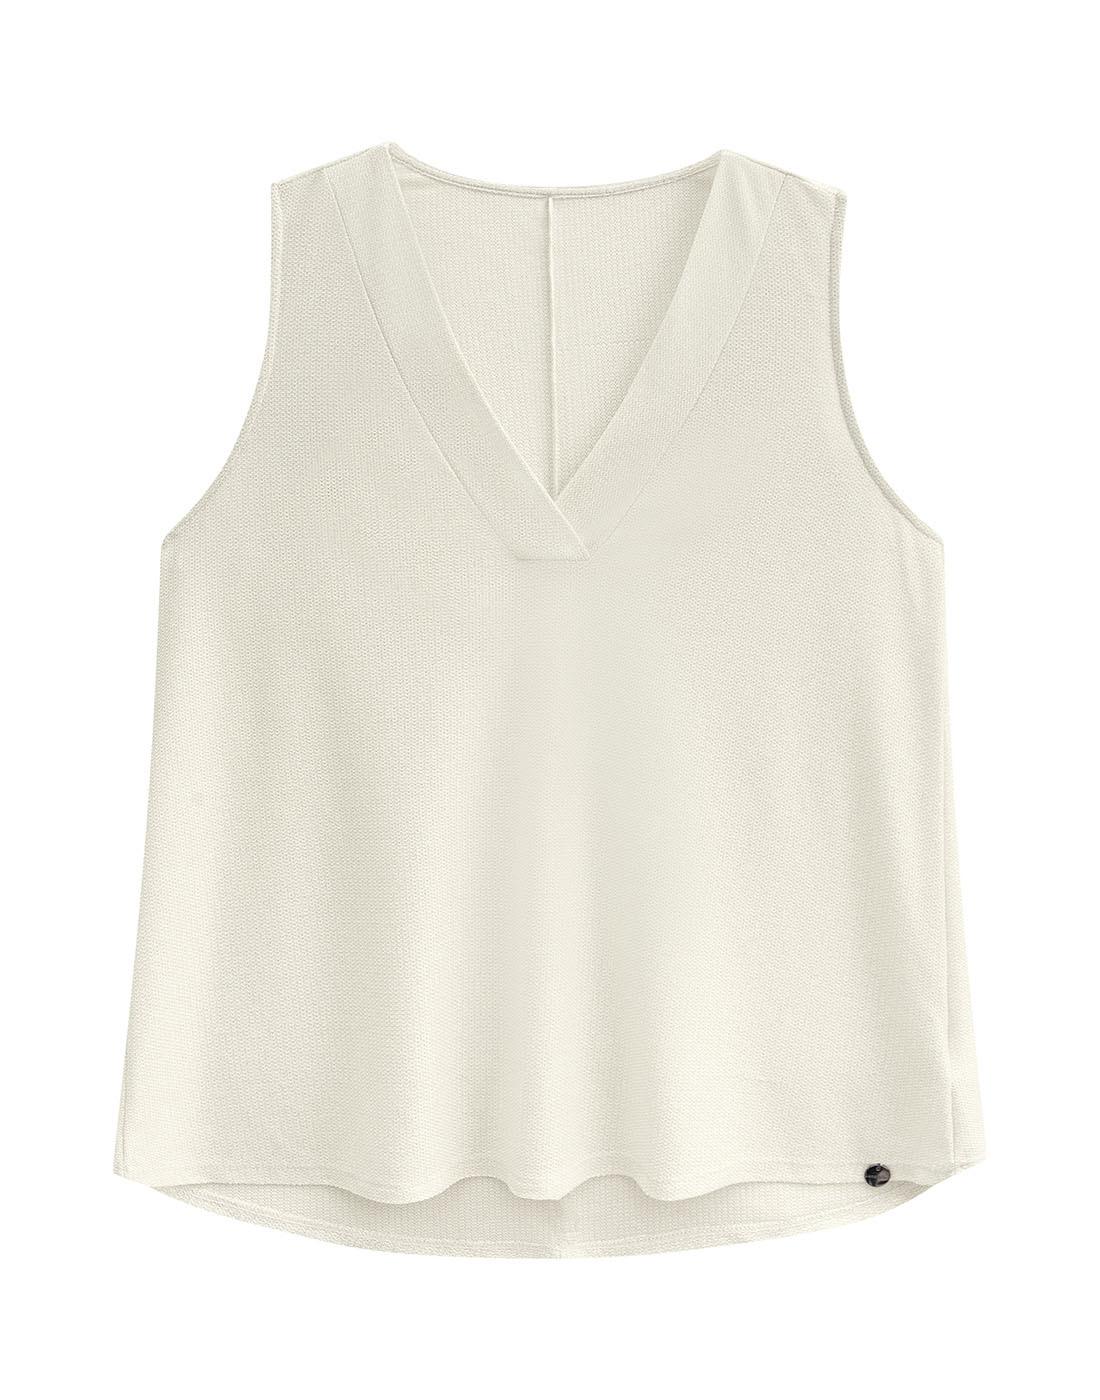 Blusa Malha Eccentric Shine Off White Lunender Mais Mulher